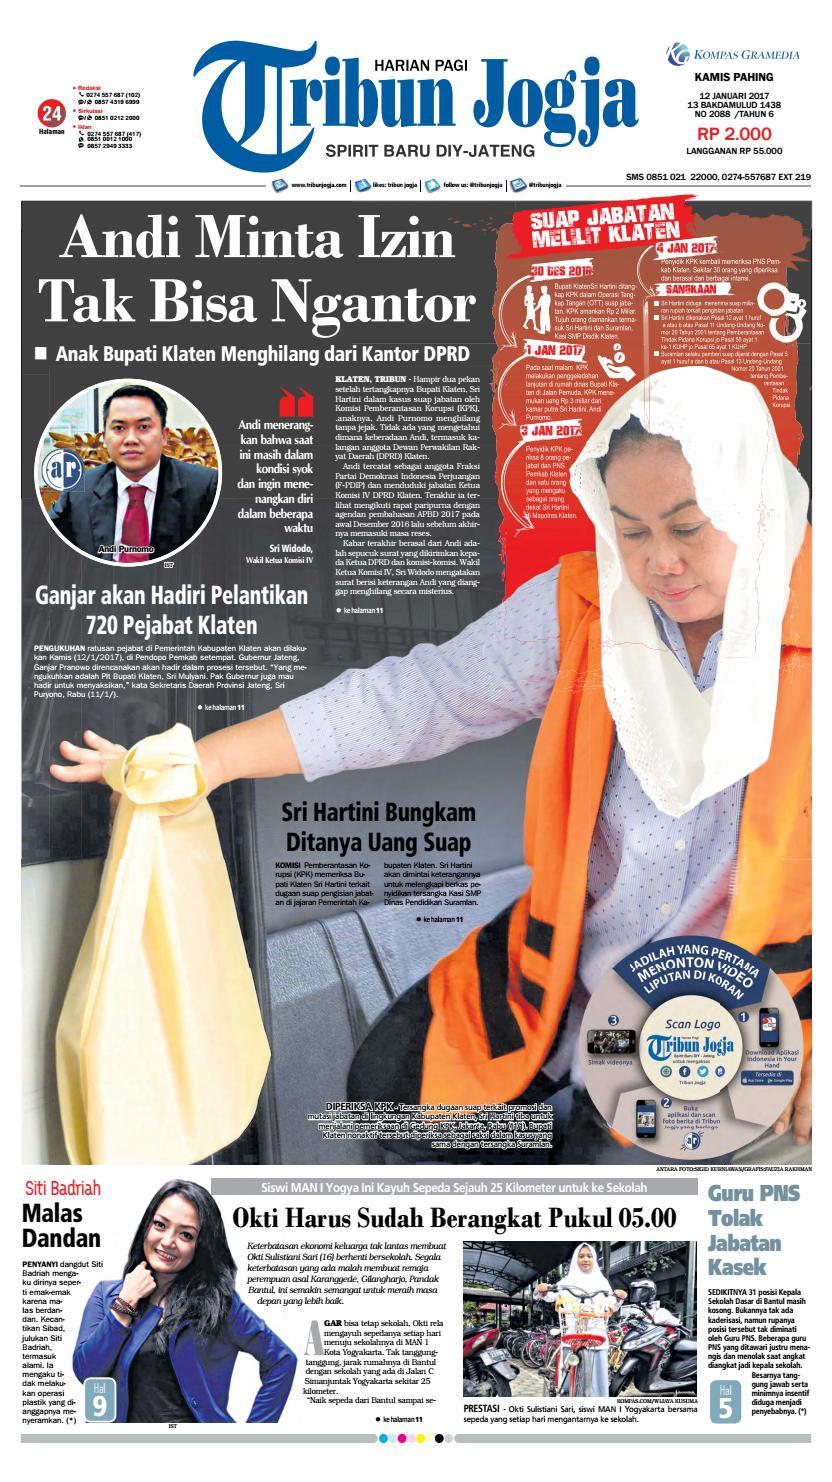 Tribunjogja 12 01 2017 By Tribun Jogja Issuu Produk Ukm Bumn Sambal Bawang Goreng Maklin